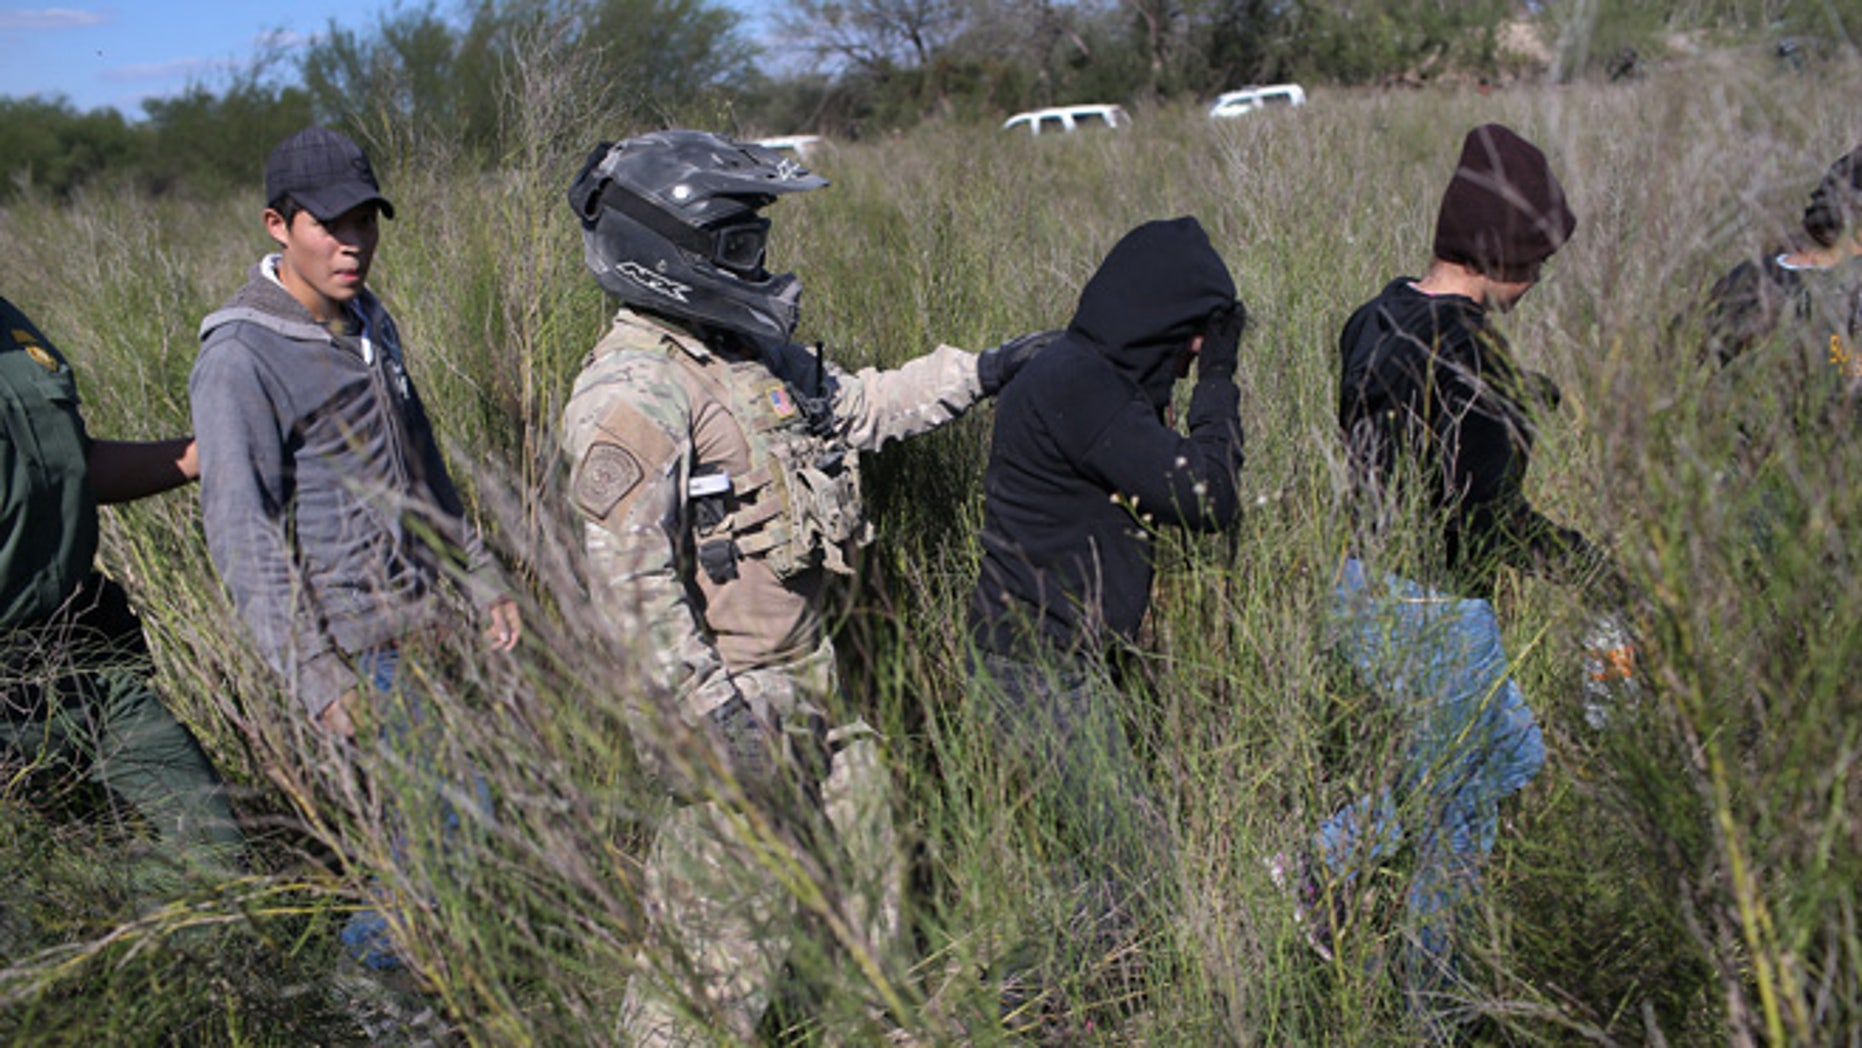 A Border Patrol agent leads undocumented immigrants on December 7, 2015 near Rio Grande City, Texas.